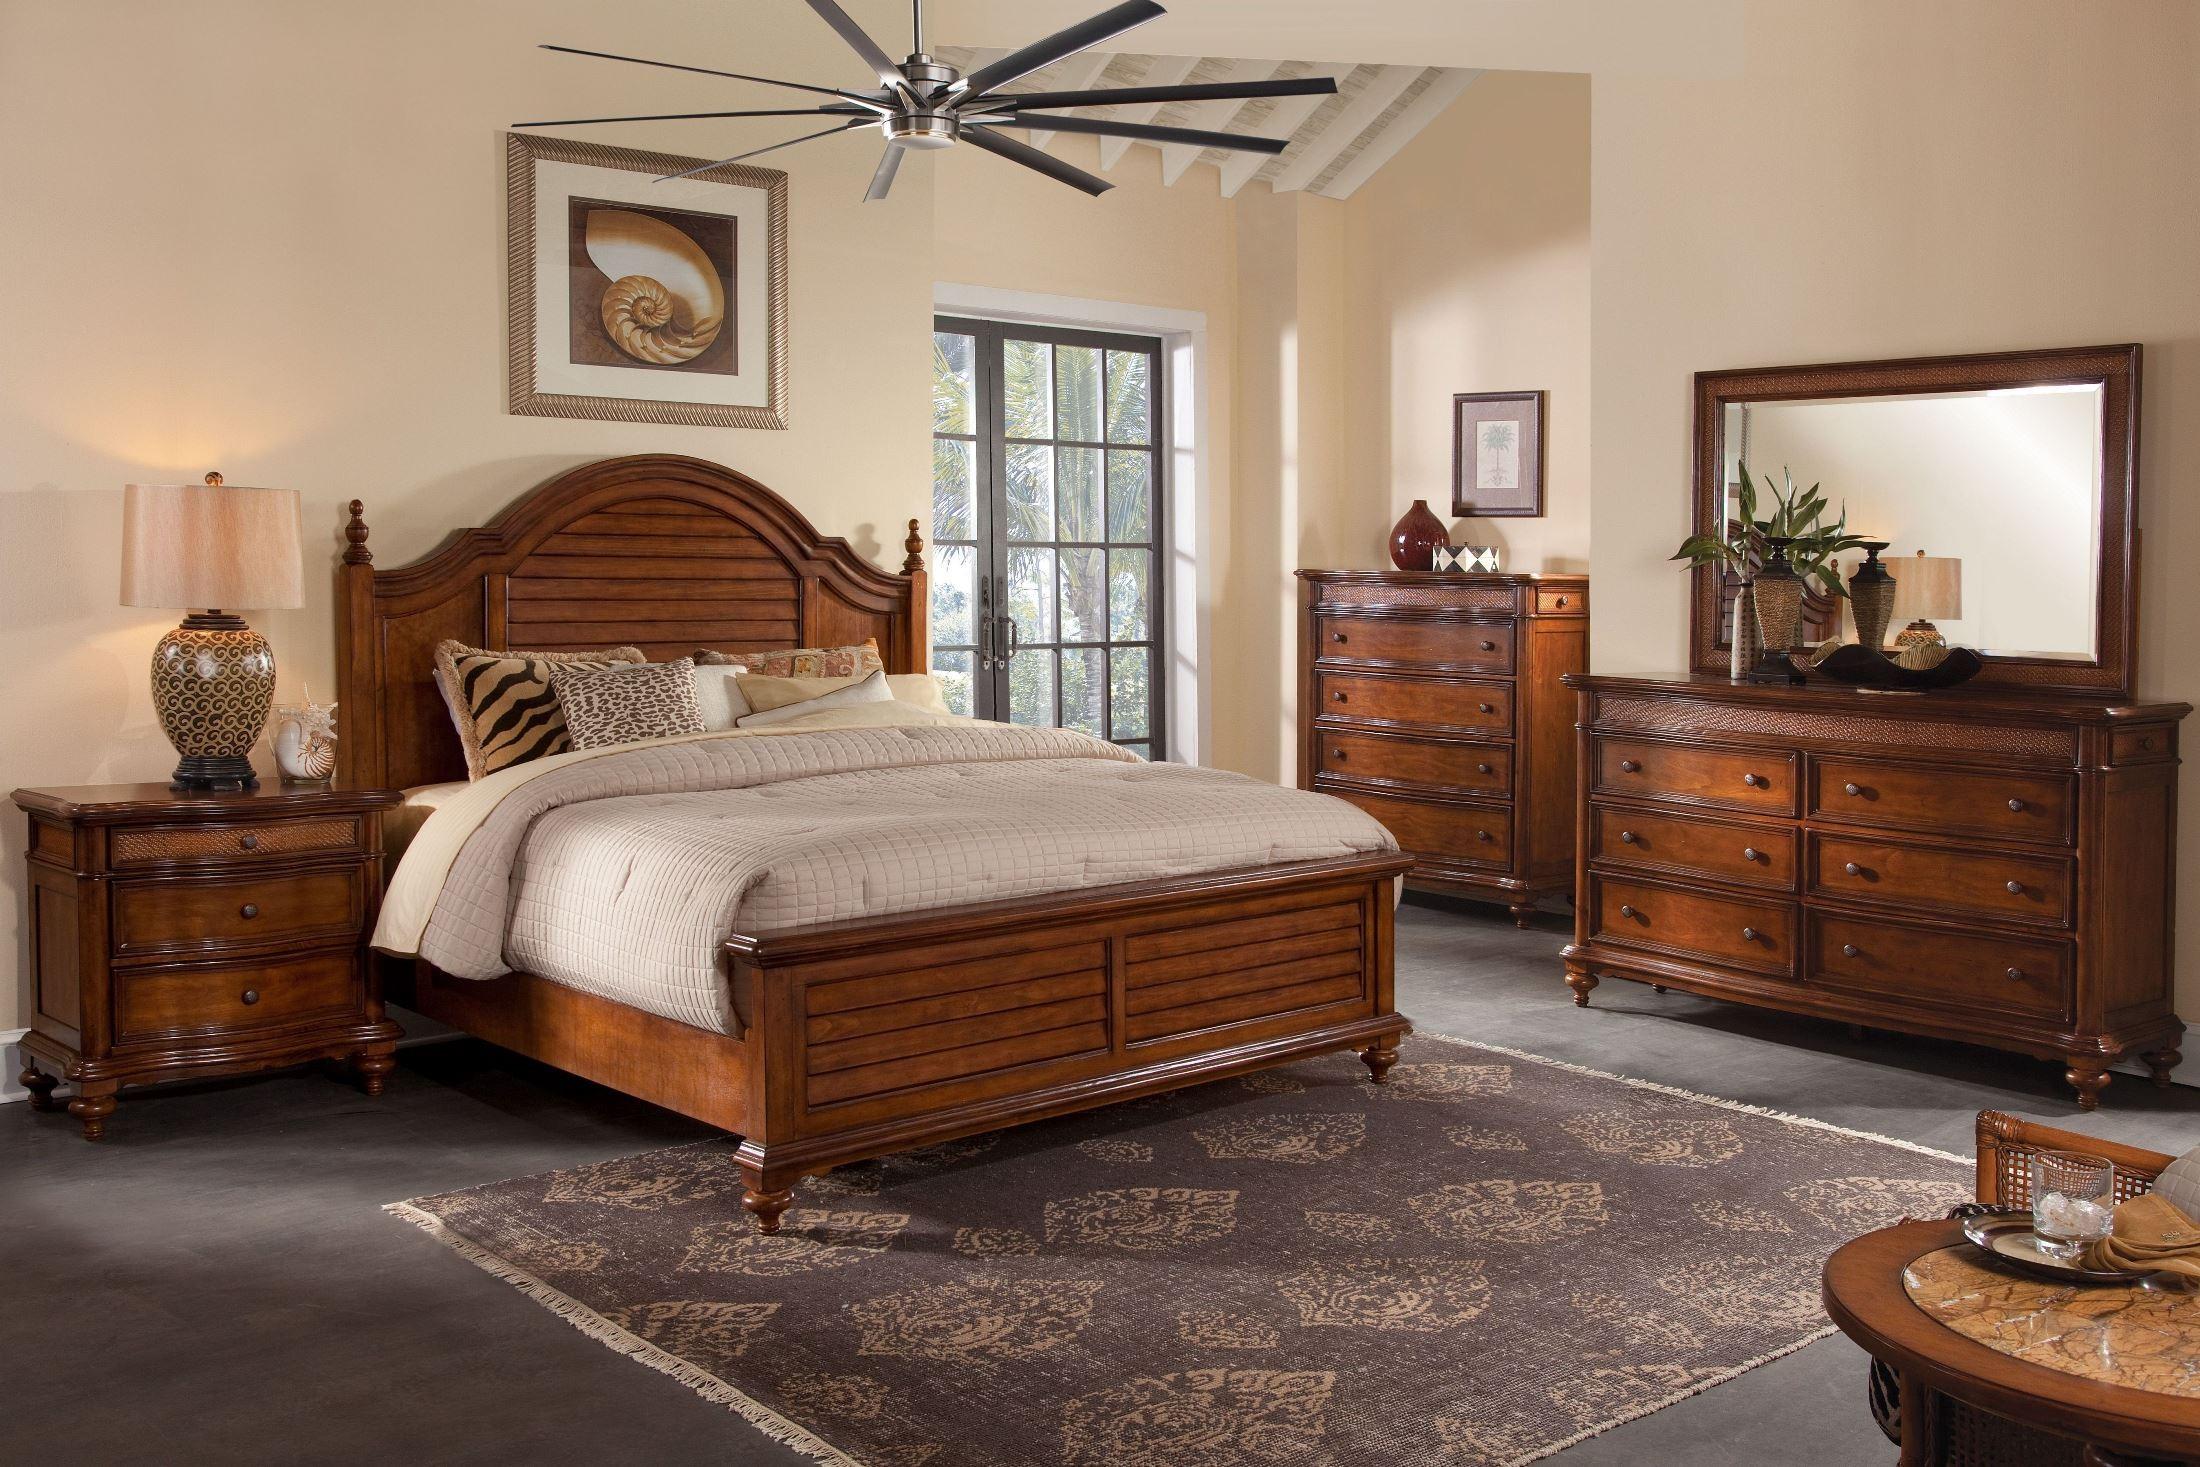 Hudson Bay Golden Brown Mansion Bedroom Set From American Woodcrafters Coleman Furniture